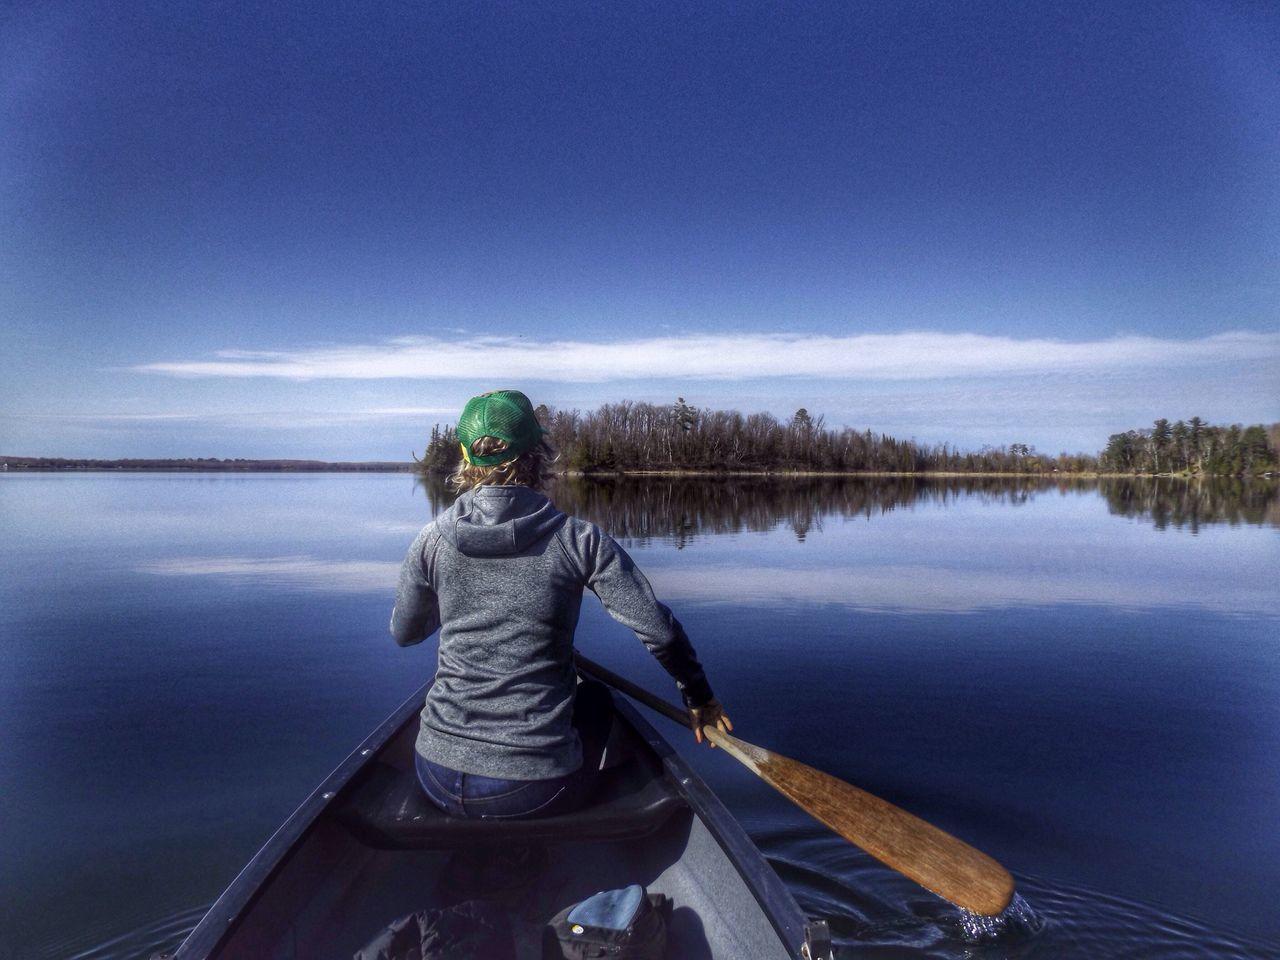 Bemidji Canoeing Paddling Reflections Lake LakeReflection Mysister Calm Glass